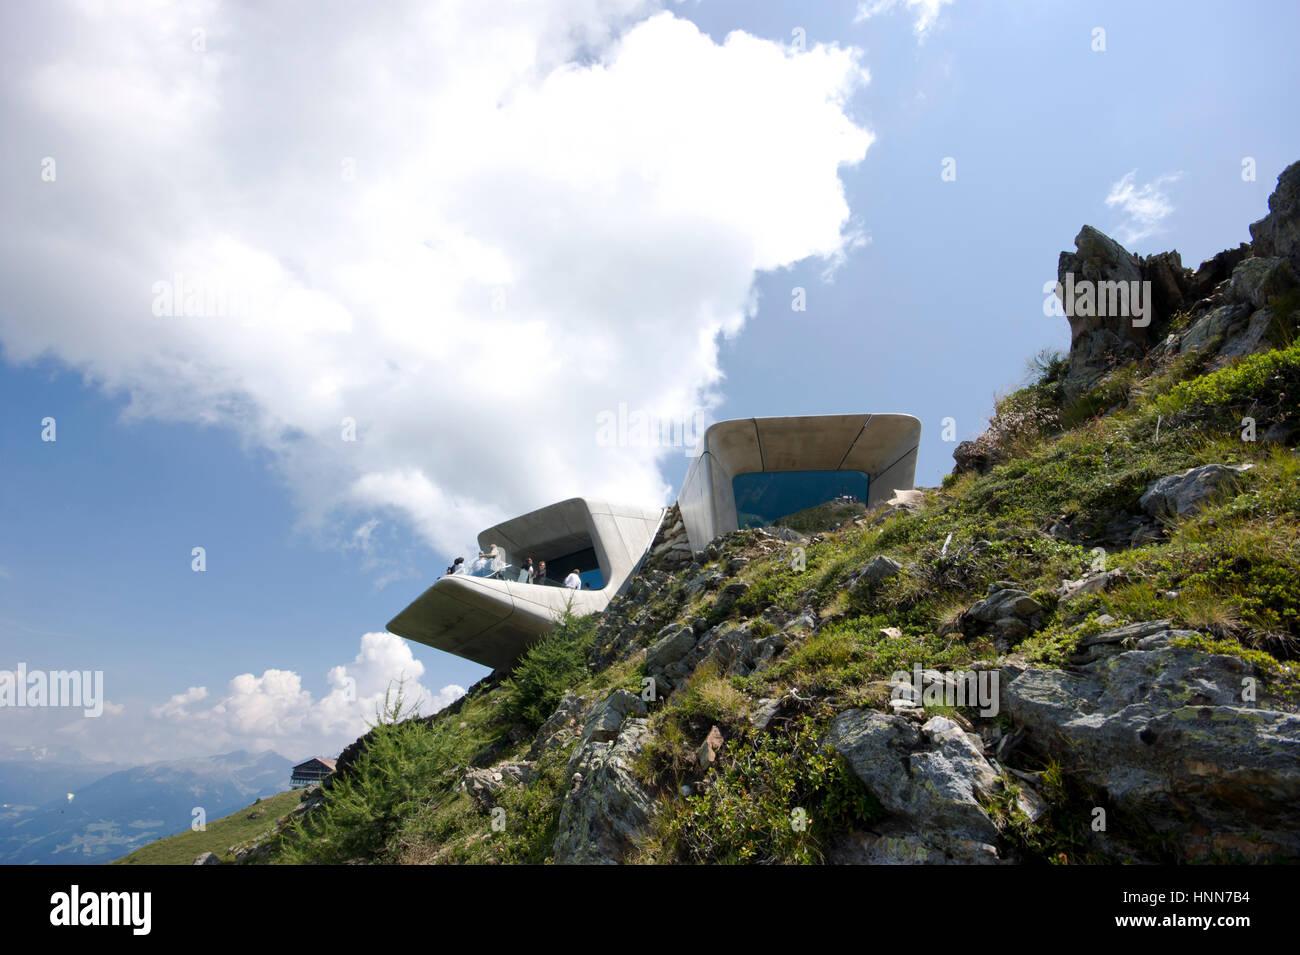 Zaha Hadid Architects Messner Corones Mountain Museum Italy exterior view from below Inexhibit - Stock Image